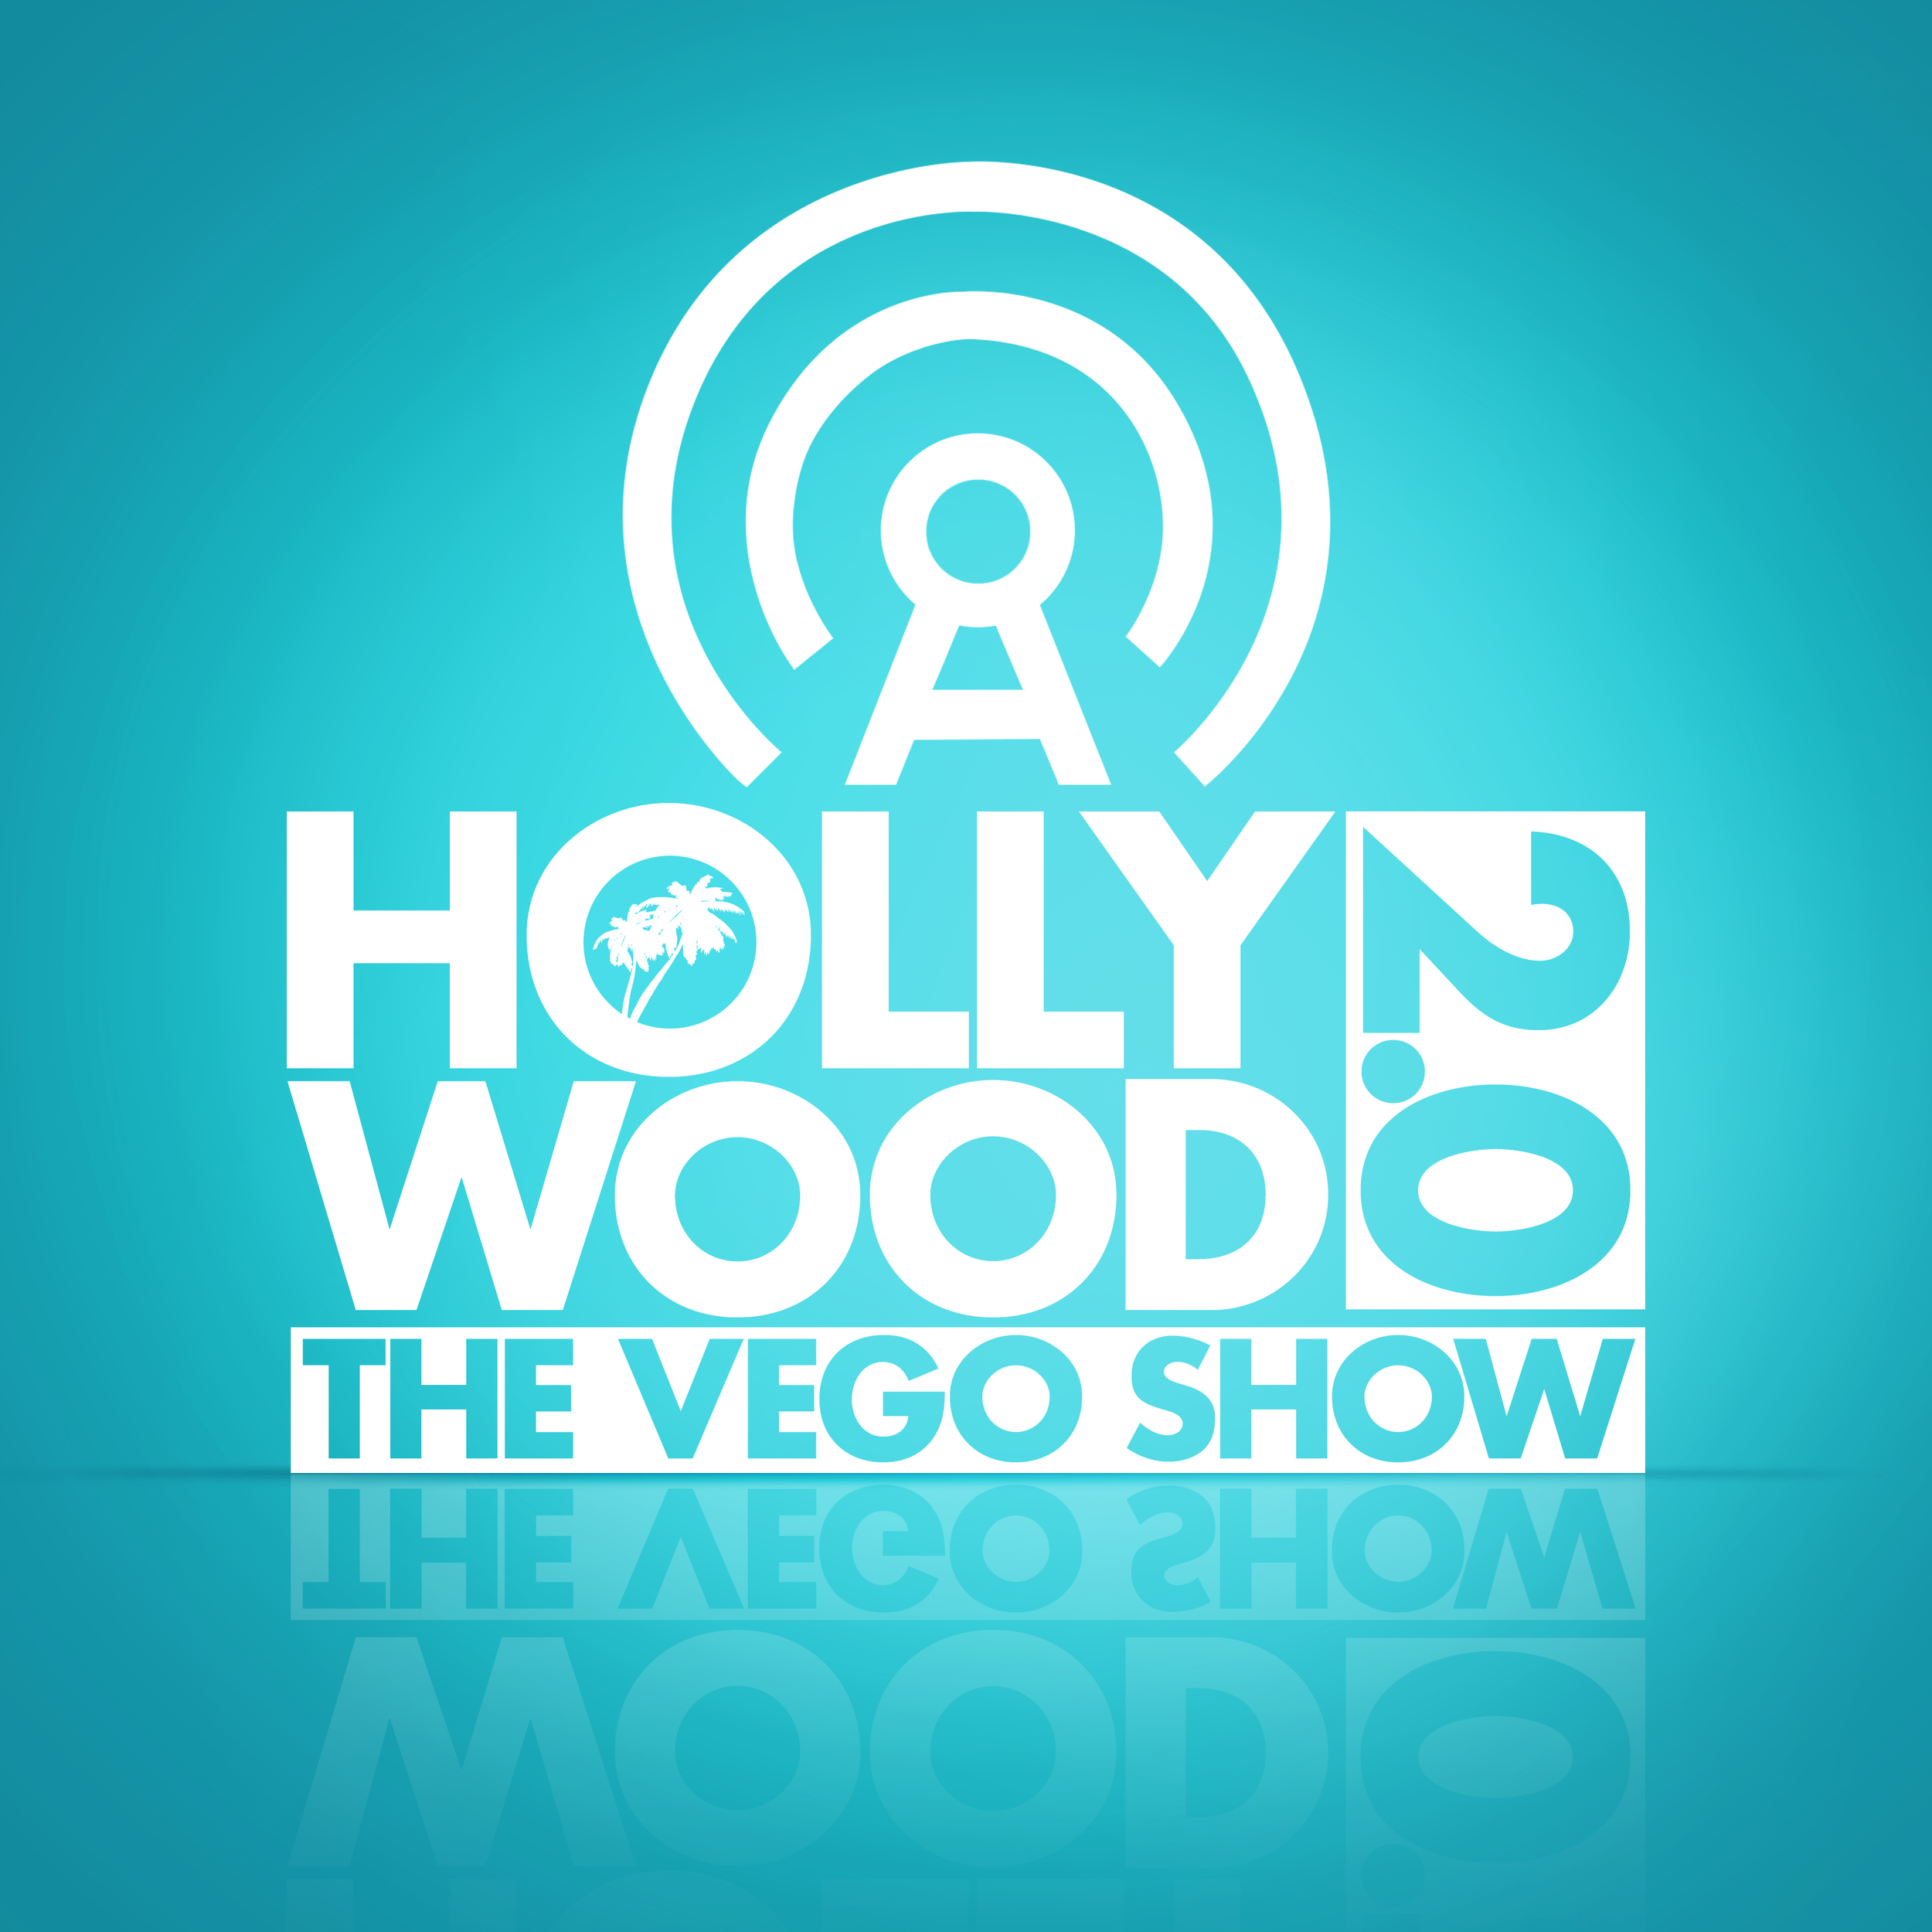 VEGO_HOLLYWOOD_2.0_LOGOS.png